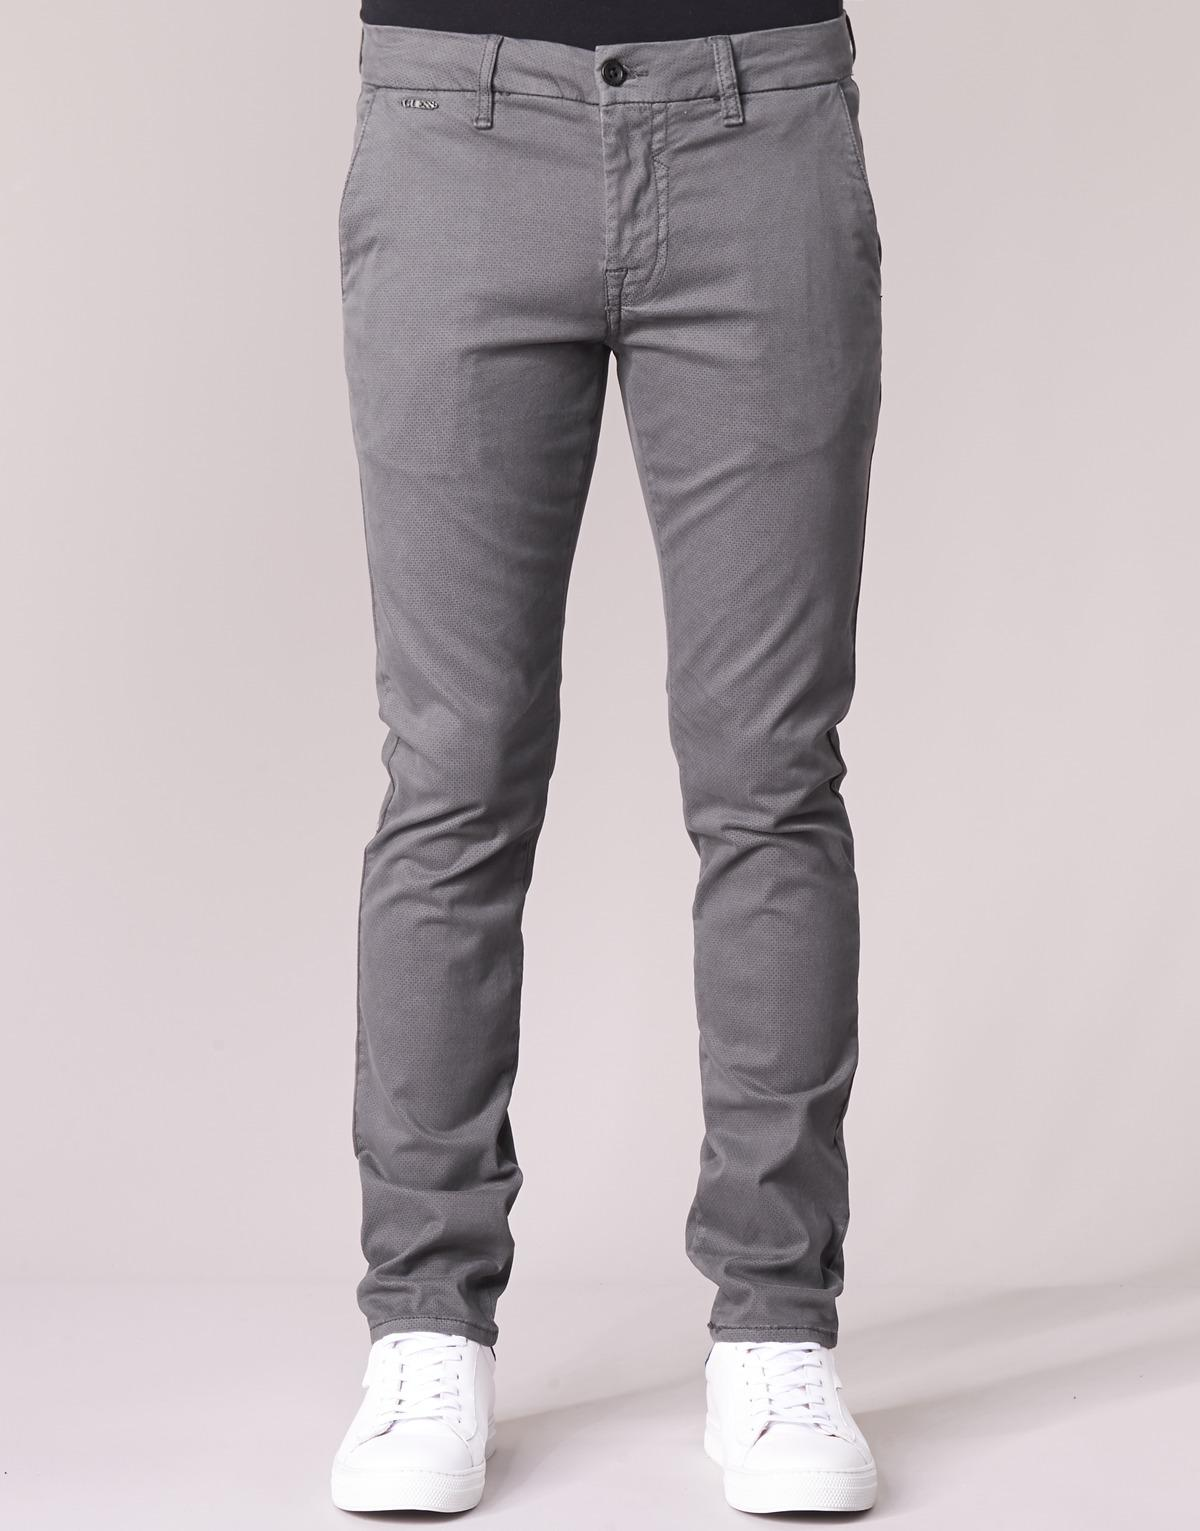 Guess Daniel Trousers in Grey (Grey) for Men